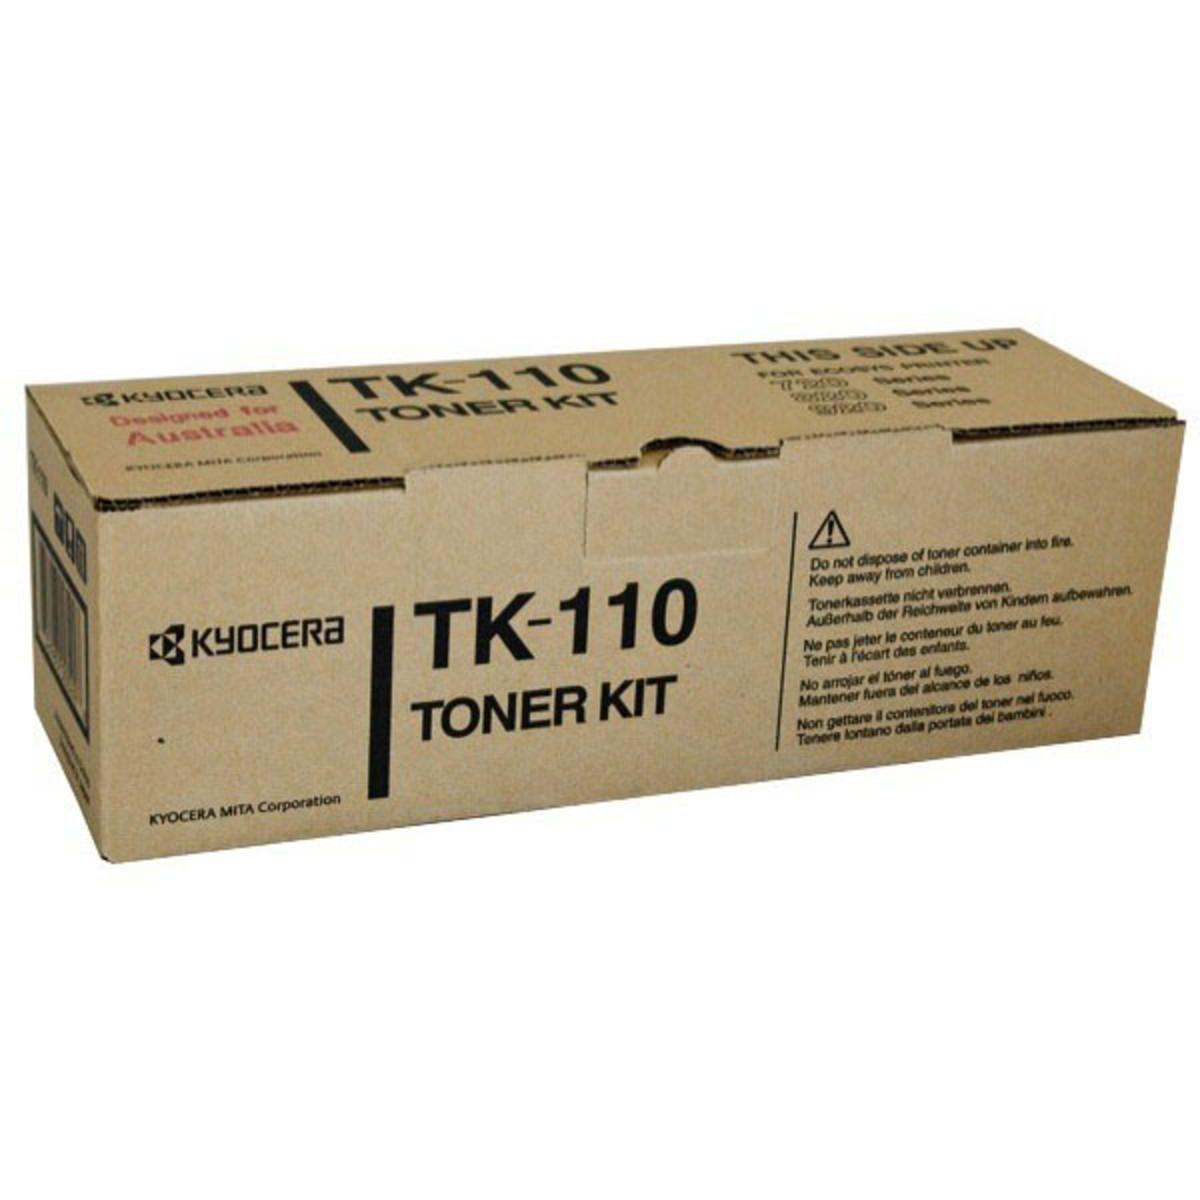 Kyocera TK-110 Black Toner Cartridge